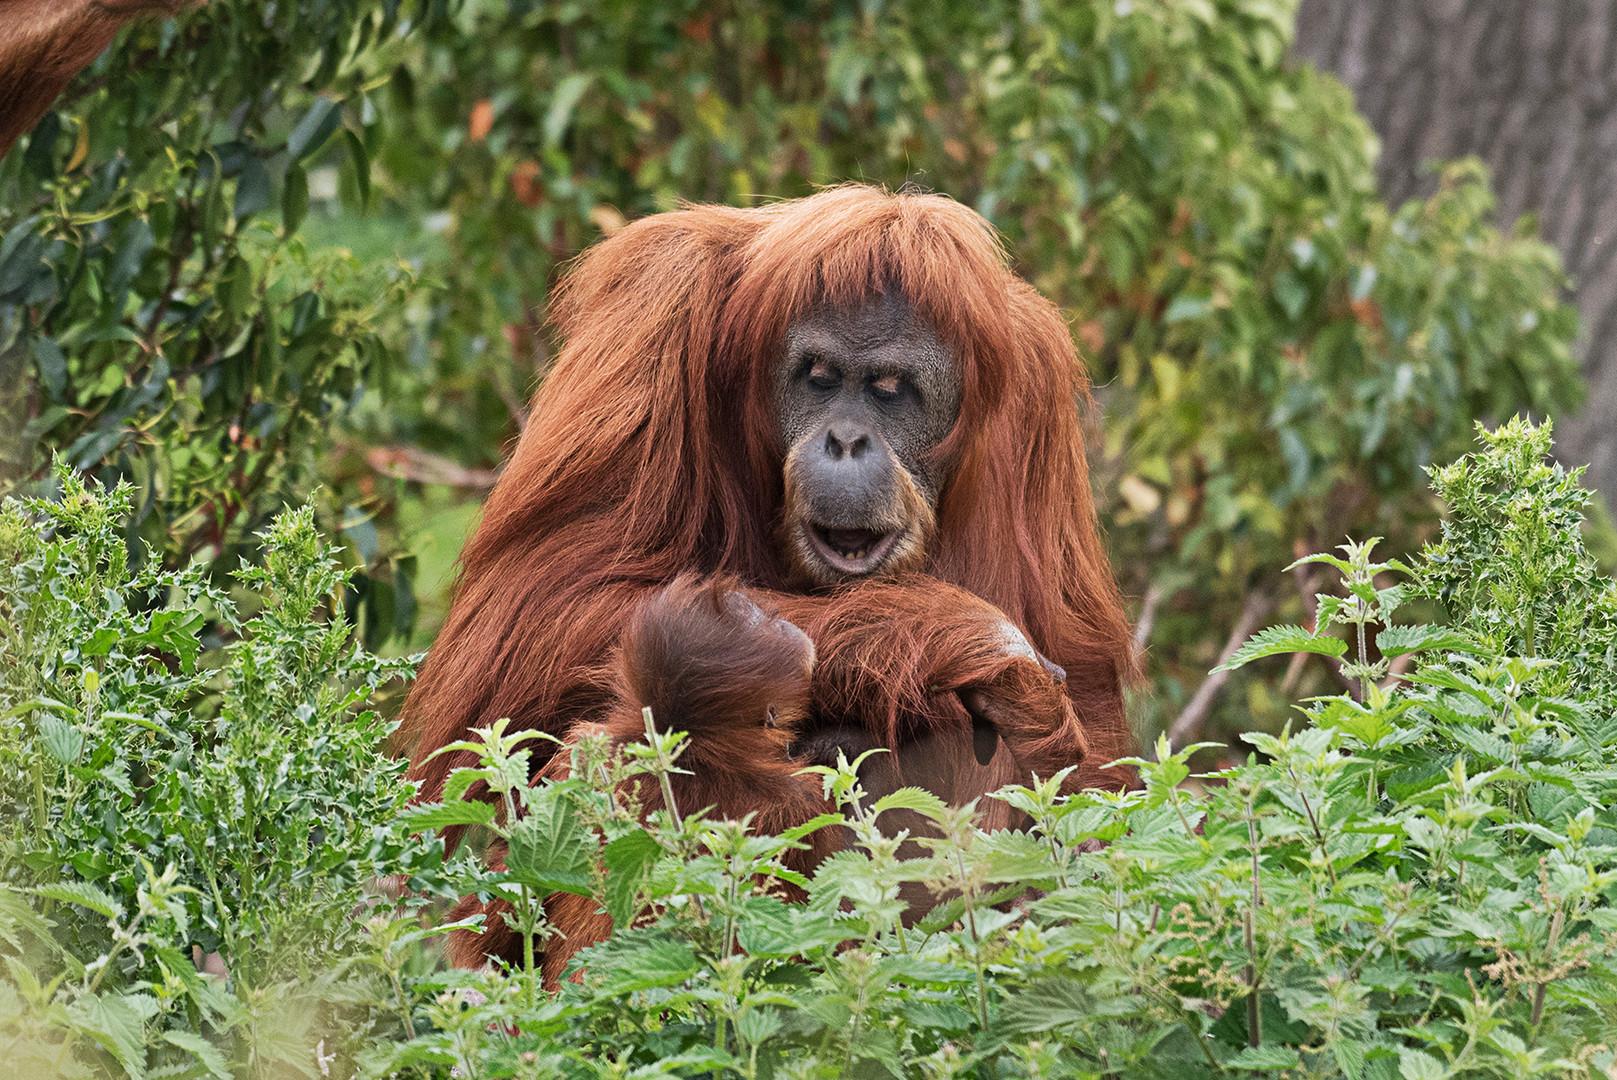 Wildlife_Photography_Course_Orangutan.jp